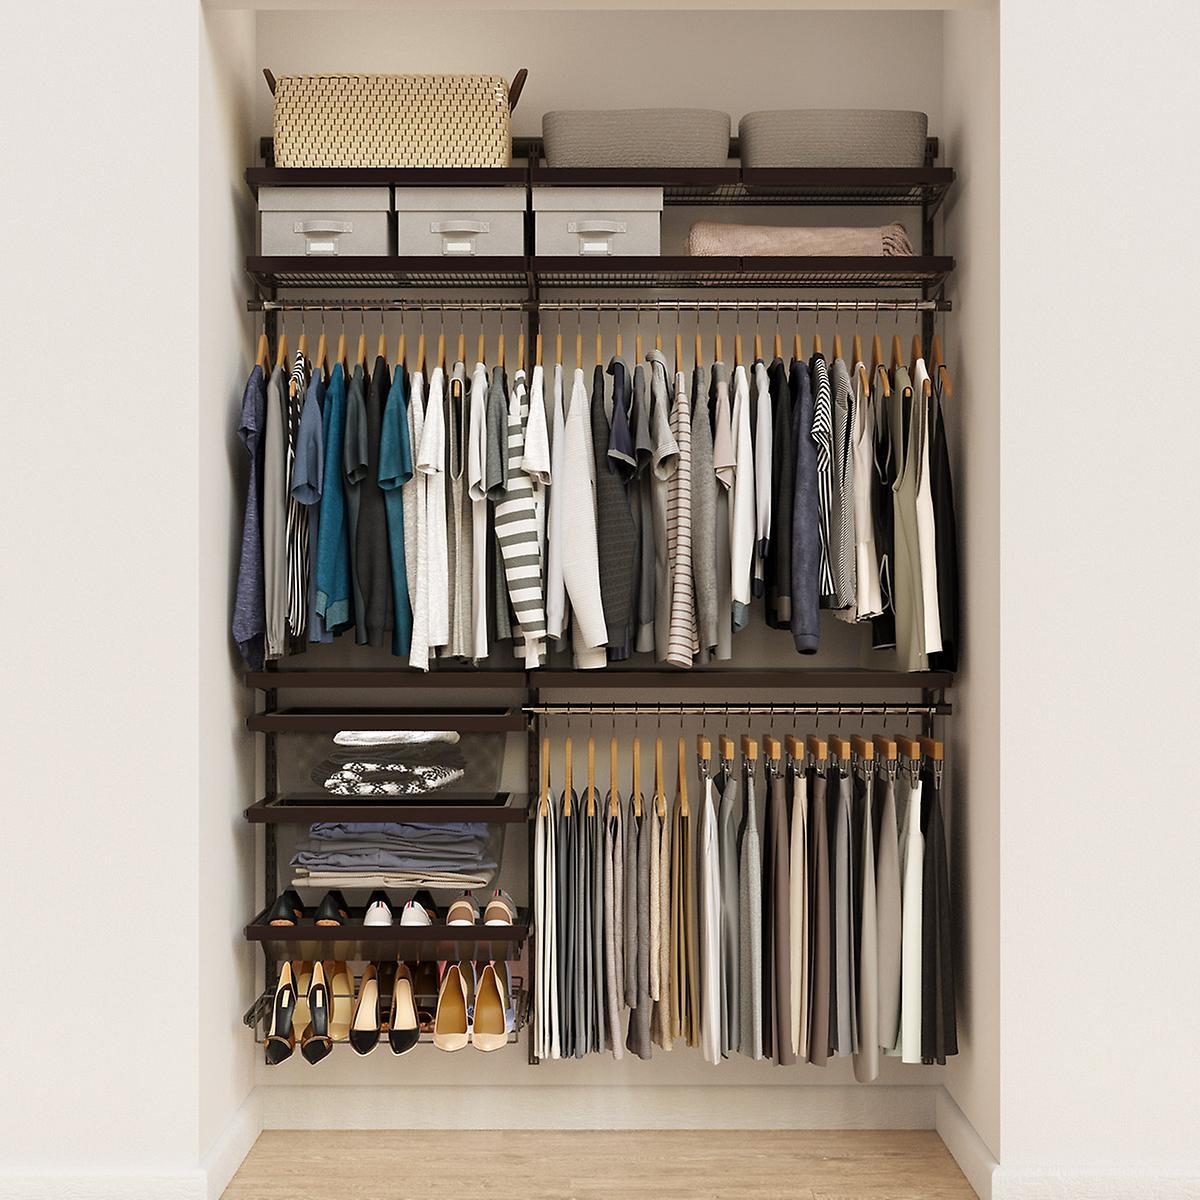 Elfa Decor 5' Graphite & Walnut Reach-In Closet